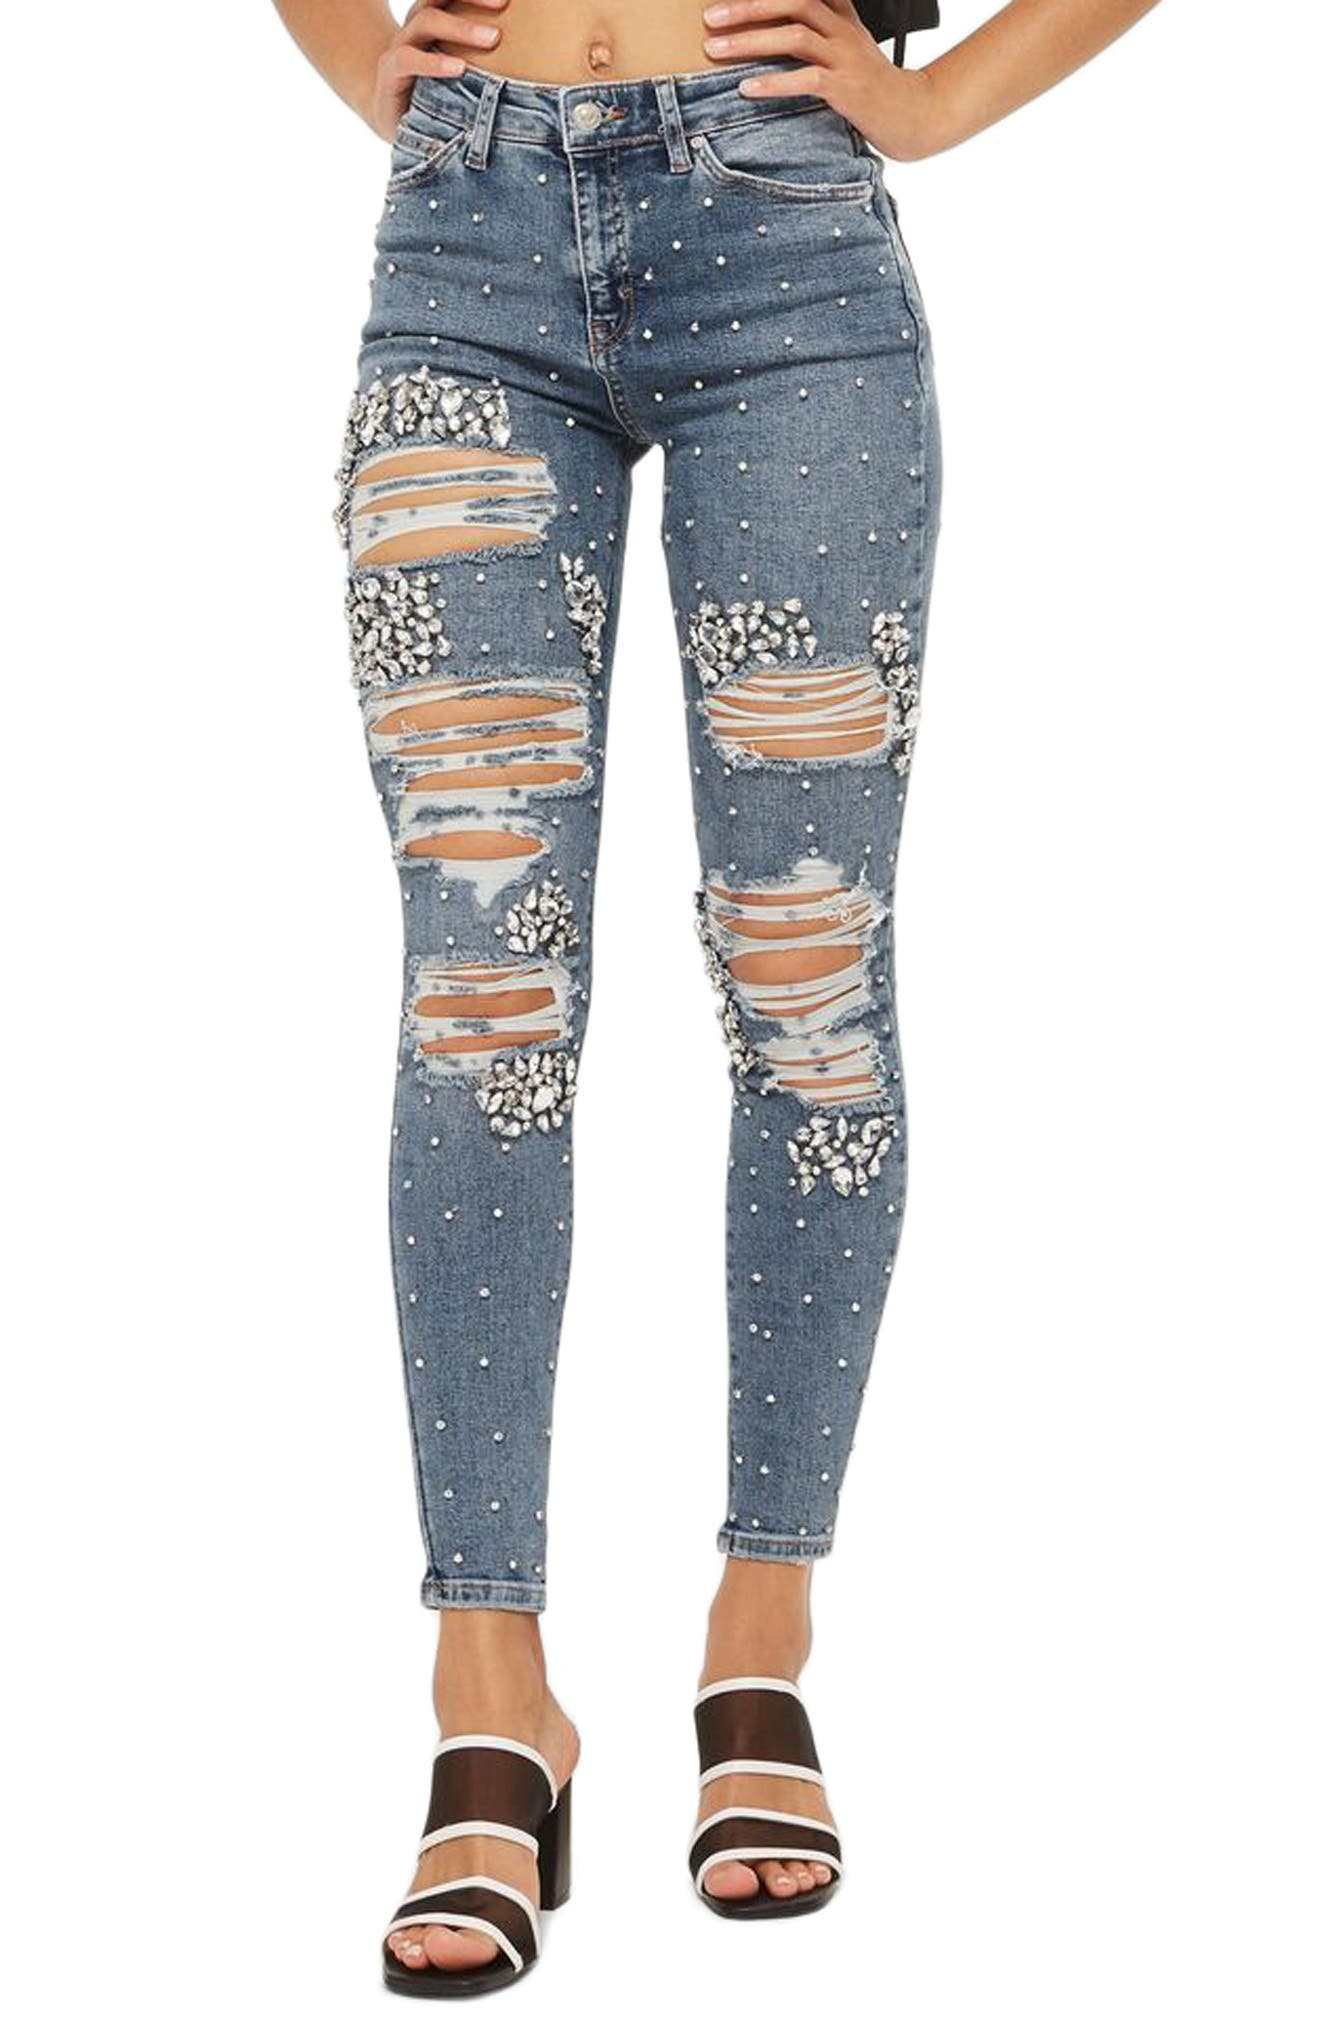 Alternate Image 1 Selected - Topshop Limited Edition Jamie Gem Encrusted Skinny Jeans